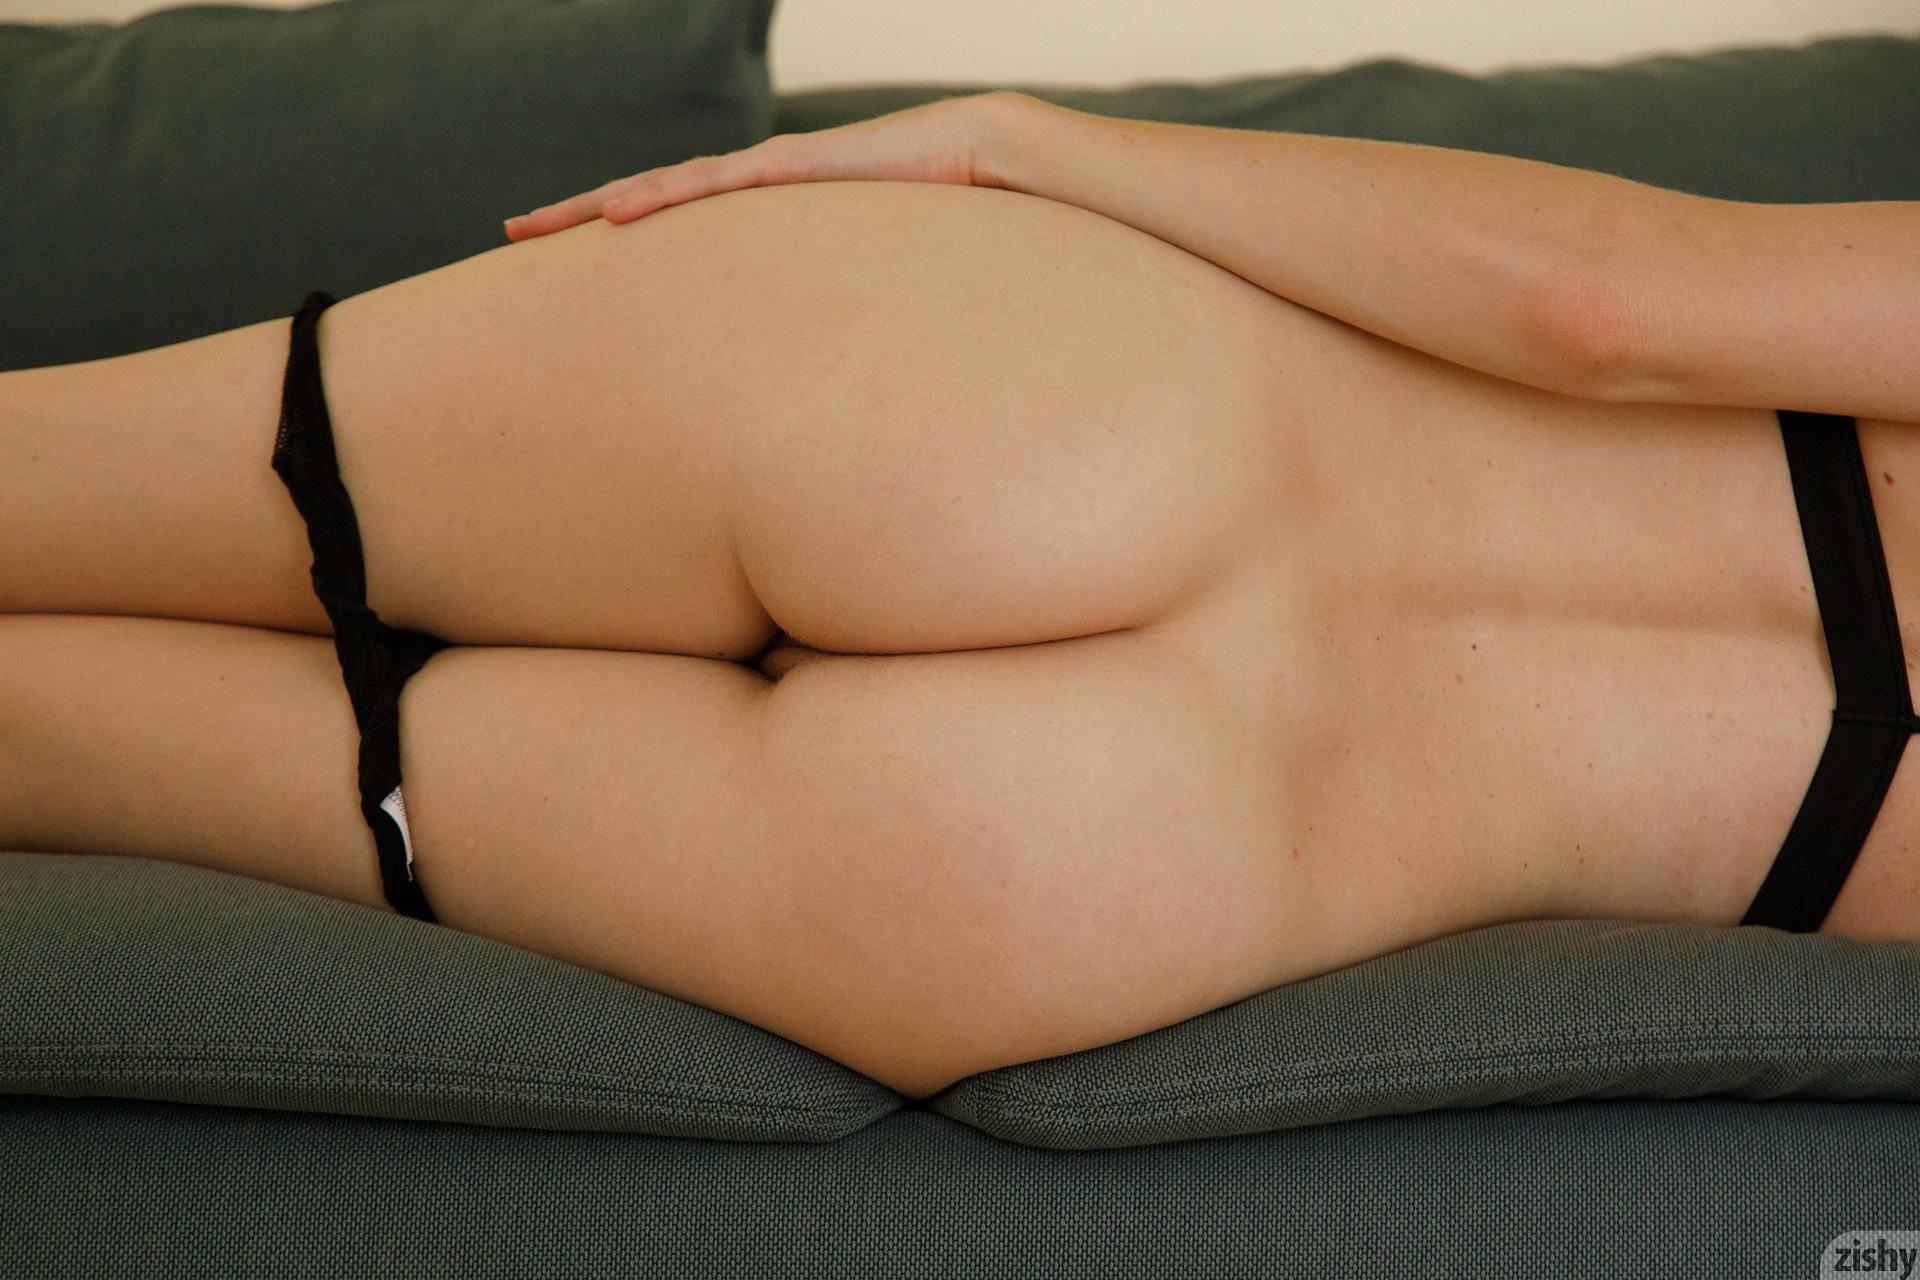 Ashley Lane Everyday People Zishy (29)